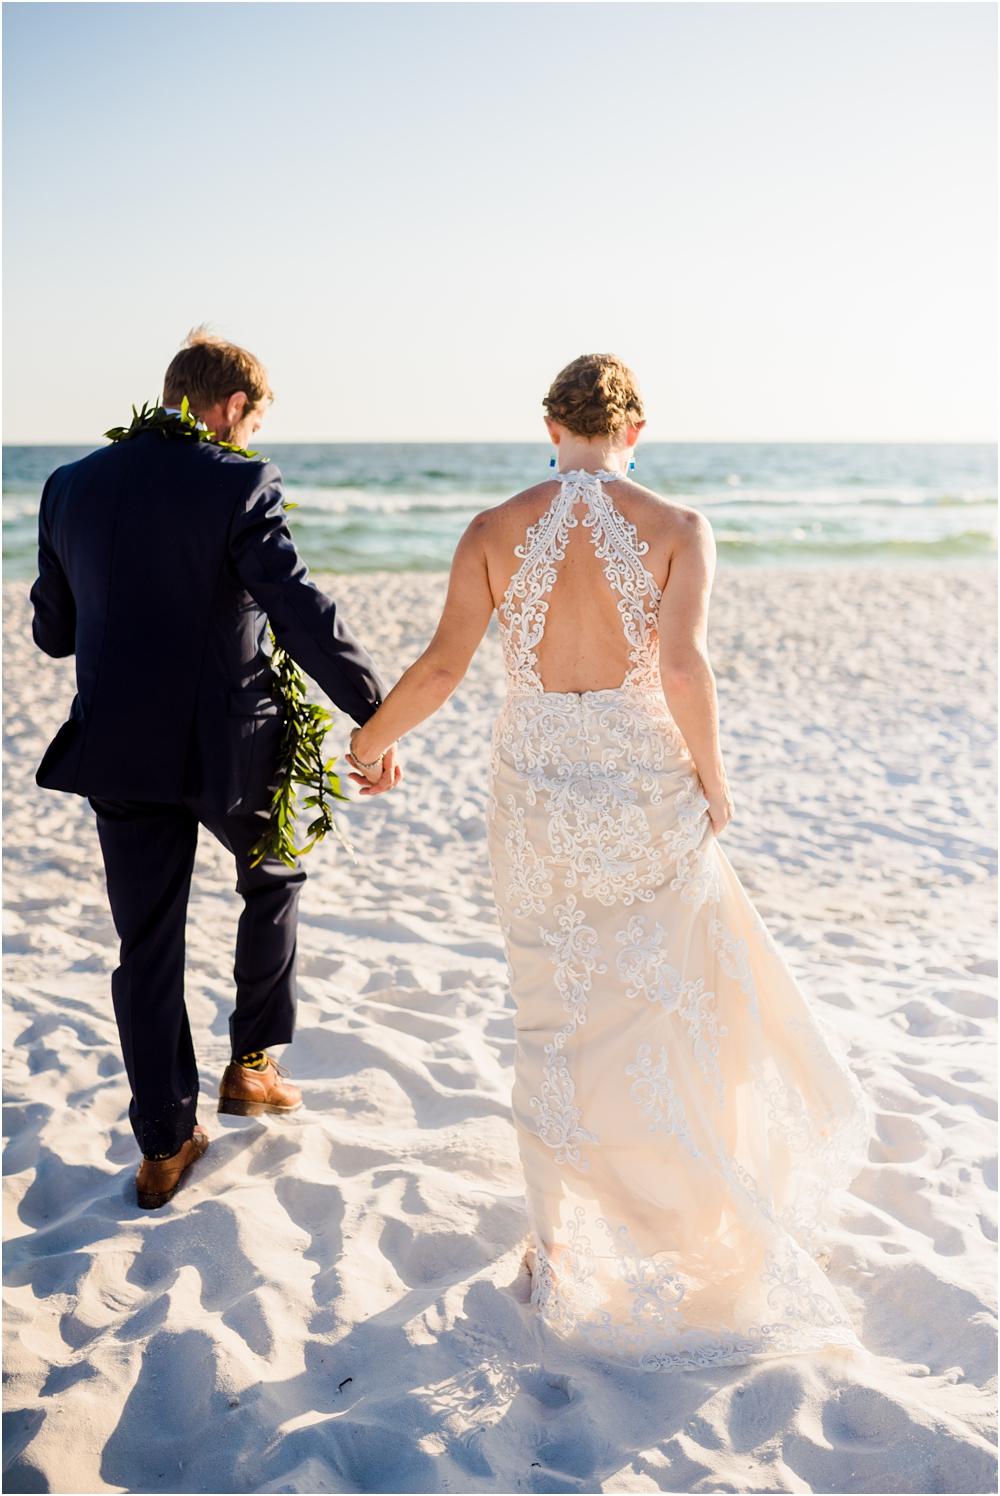 ledman-wedding-kiersten-stevenson-photography-30a-panama-city-beach-dothan-tallahassee-(263-of-763).JPG